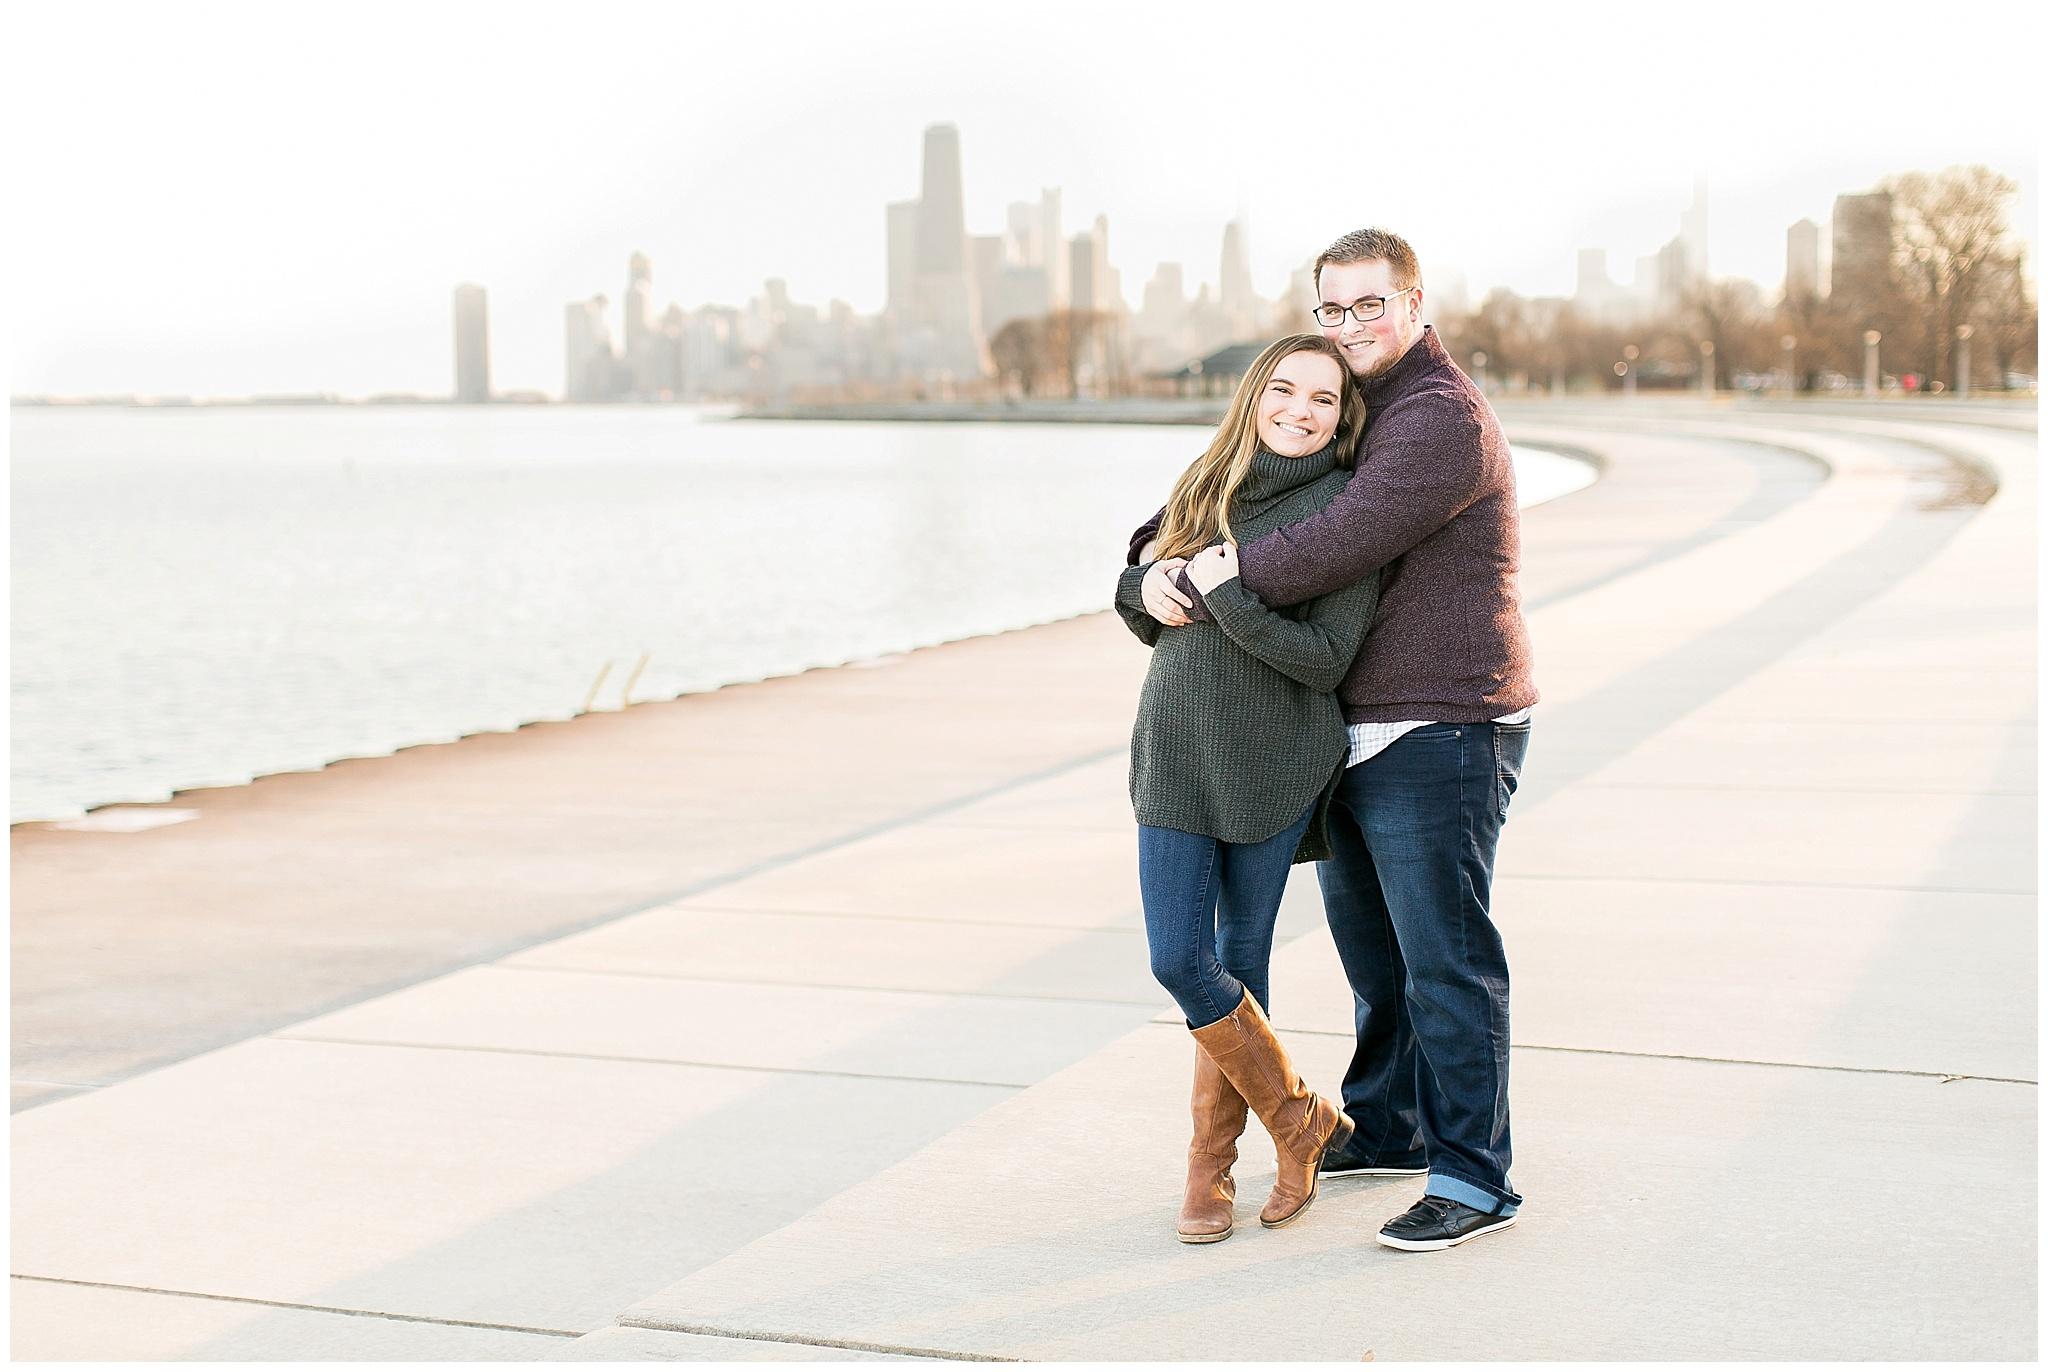 Chicago_Engagement_and_wedding_photographer_chicago_skyline_0975.jpg